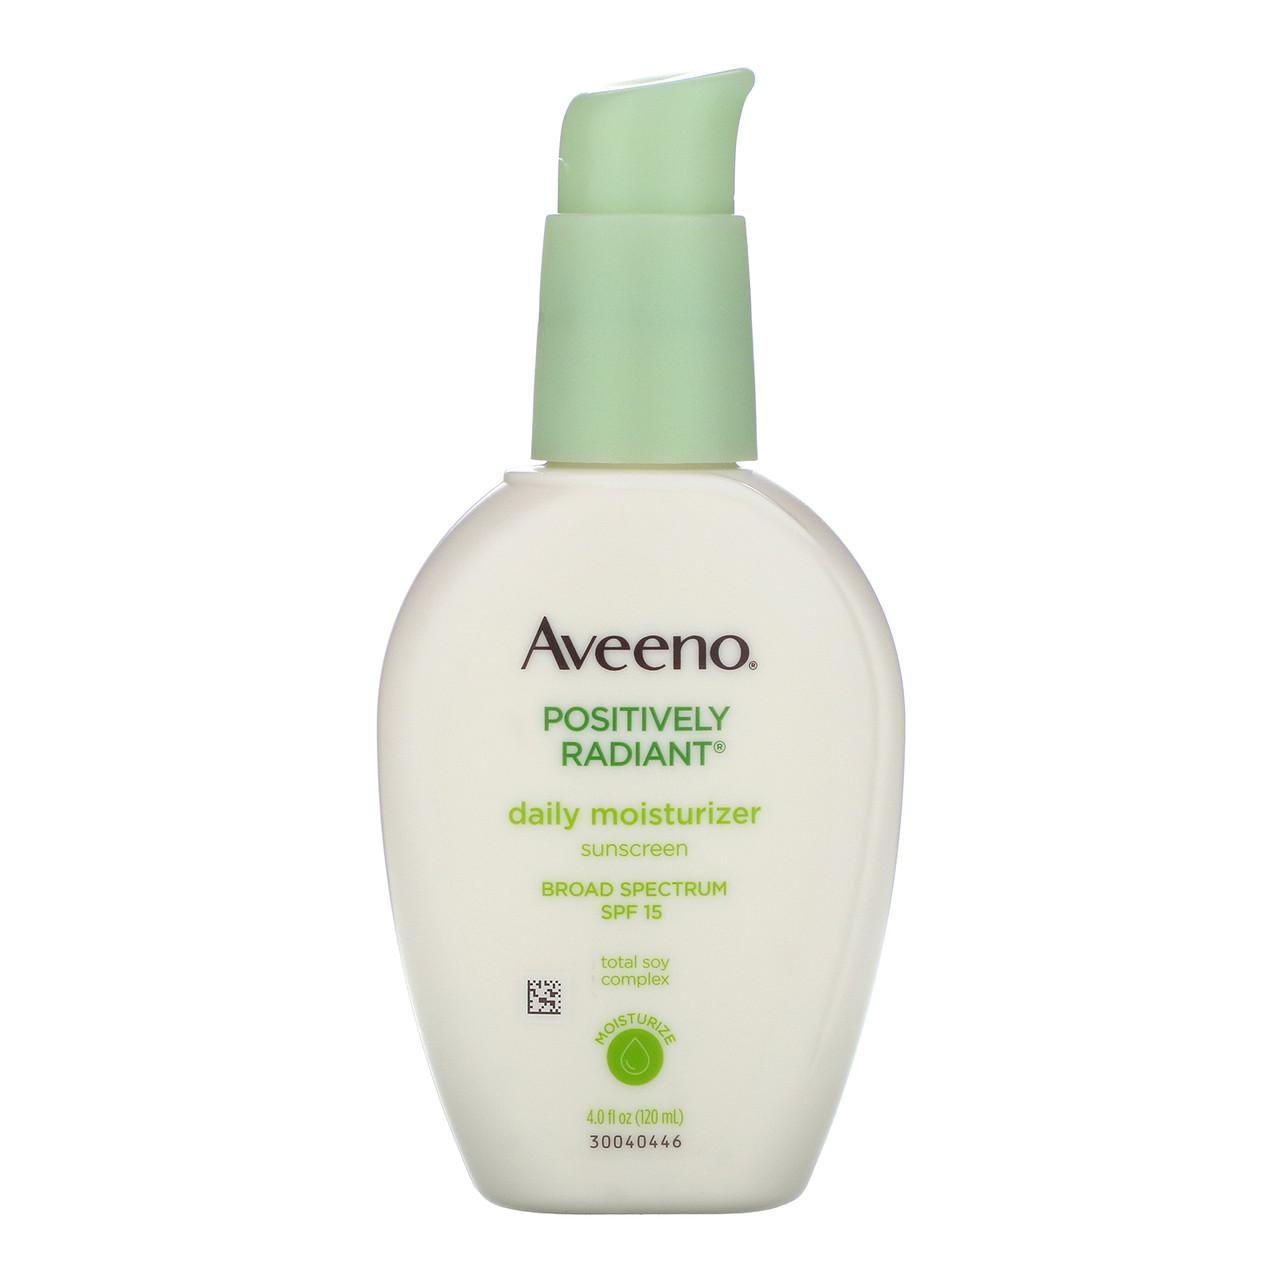 Дневной увлажняющий крем SPF 15 (Sunscreen), Aveeno,120 мл